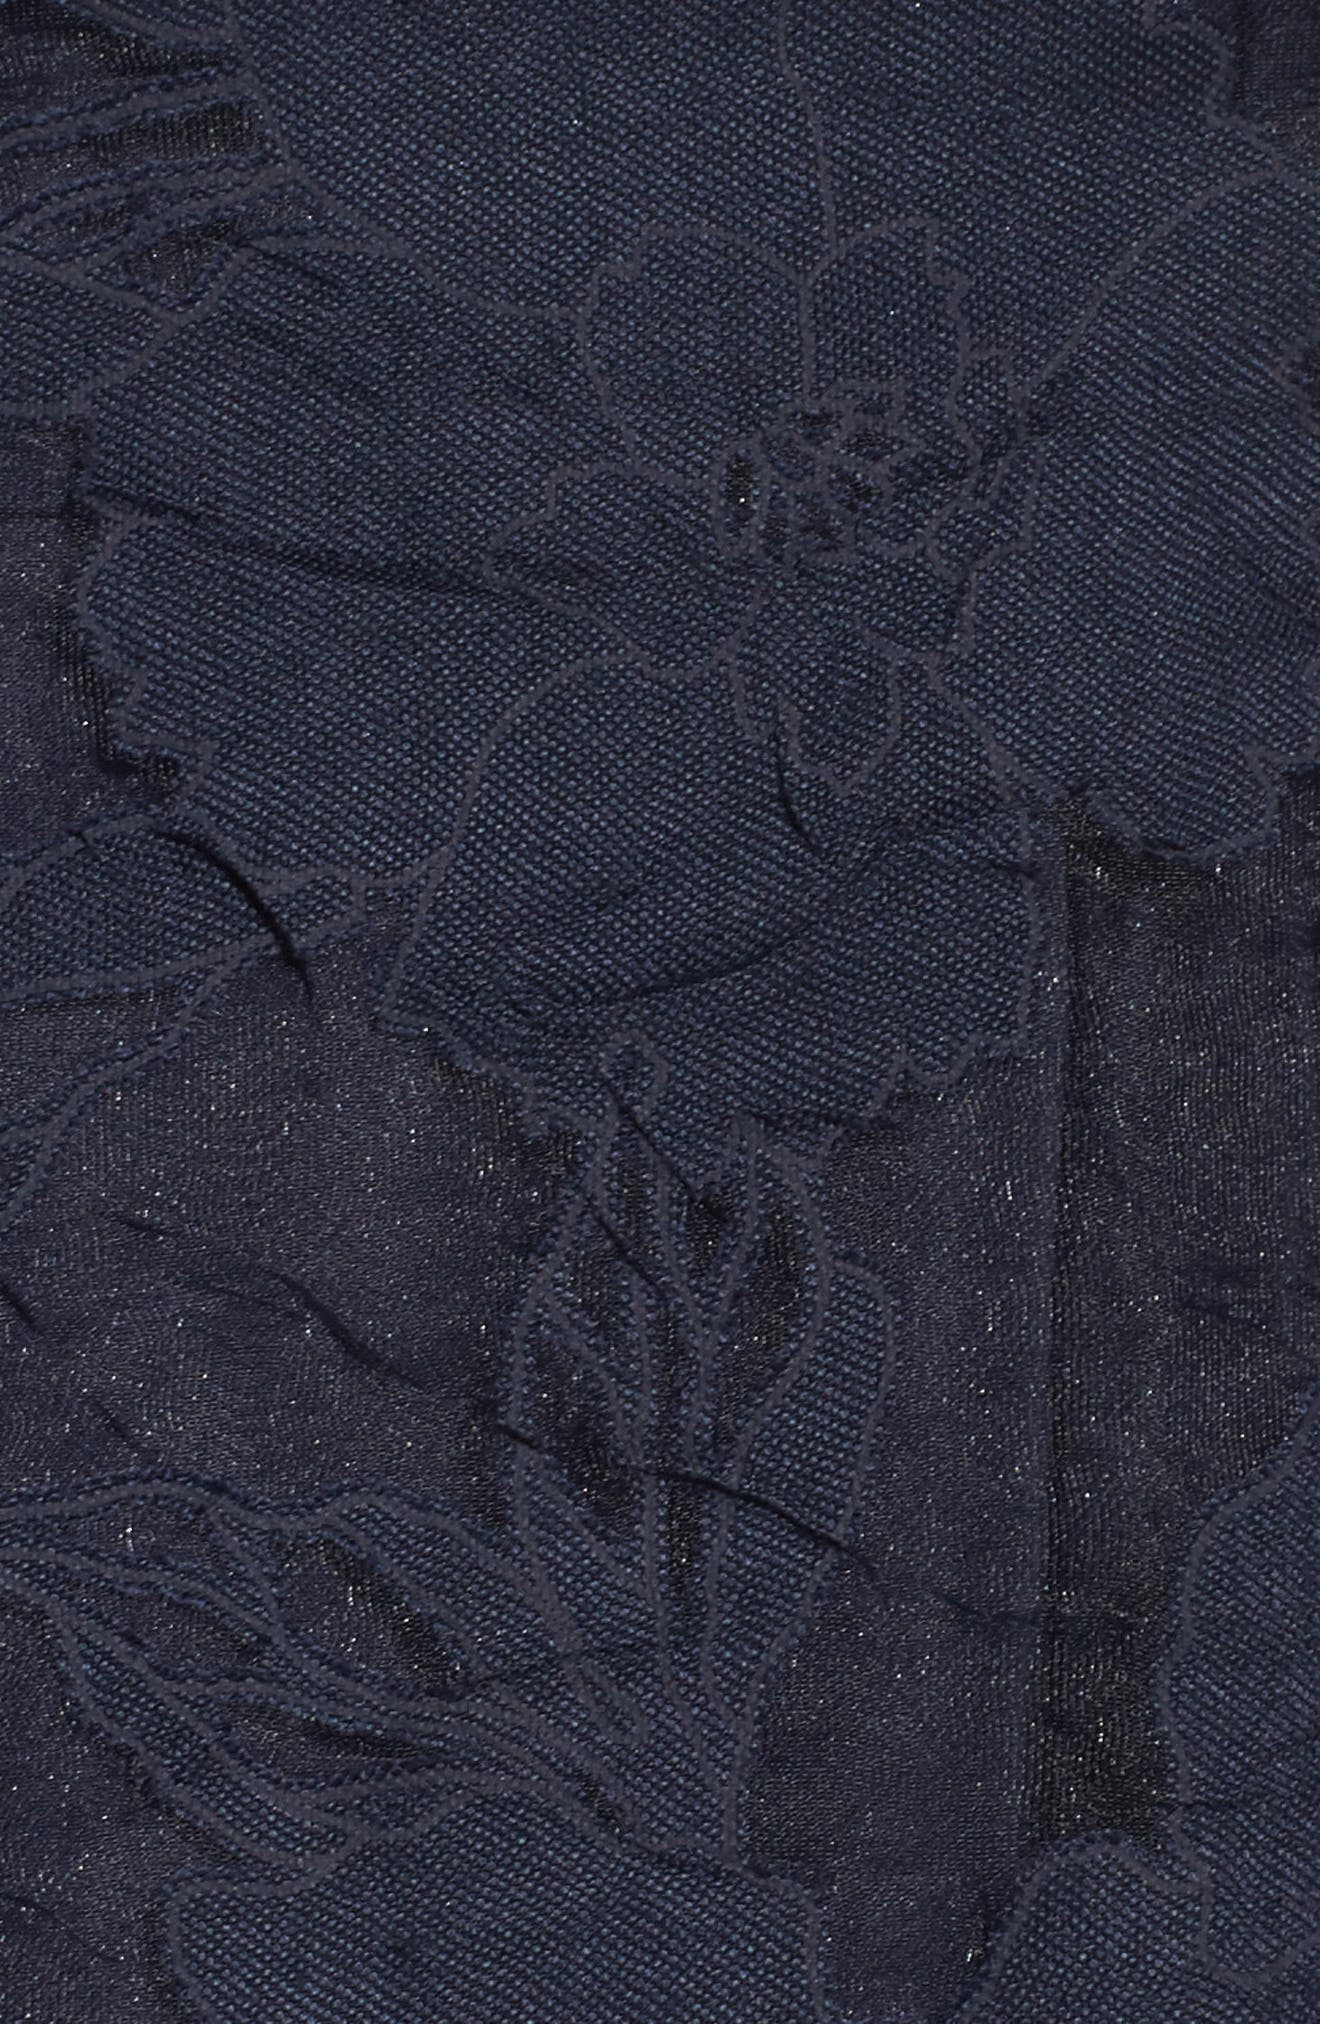 Lace Fit & Flare Dress,                             Alternate thumbnail 6, color,